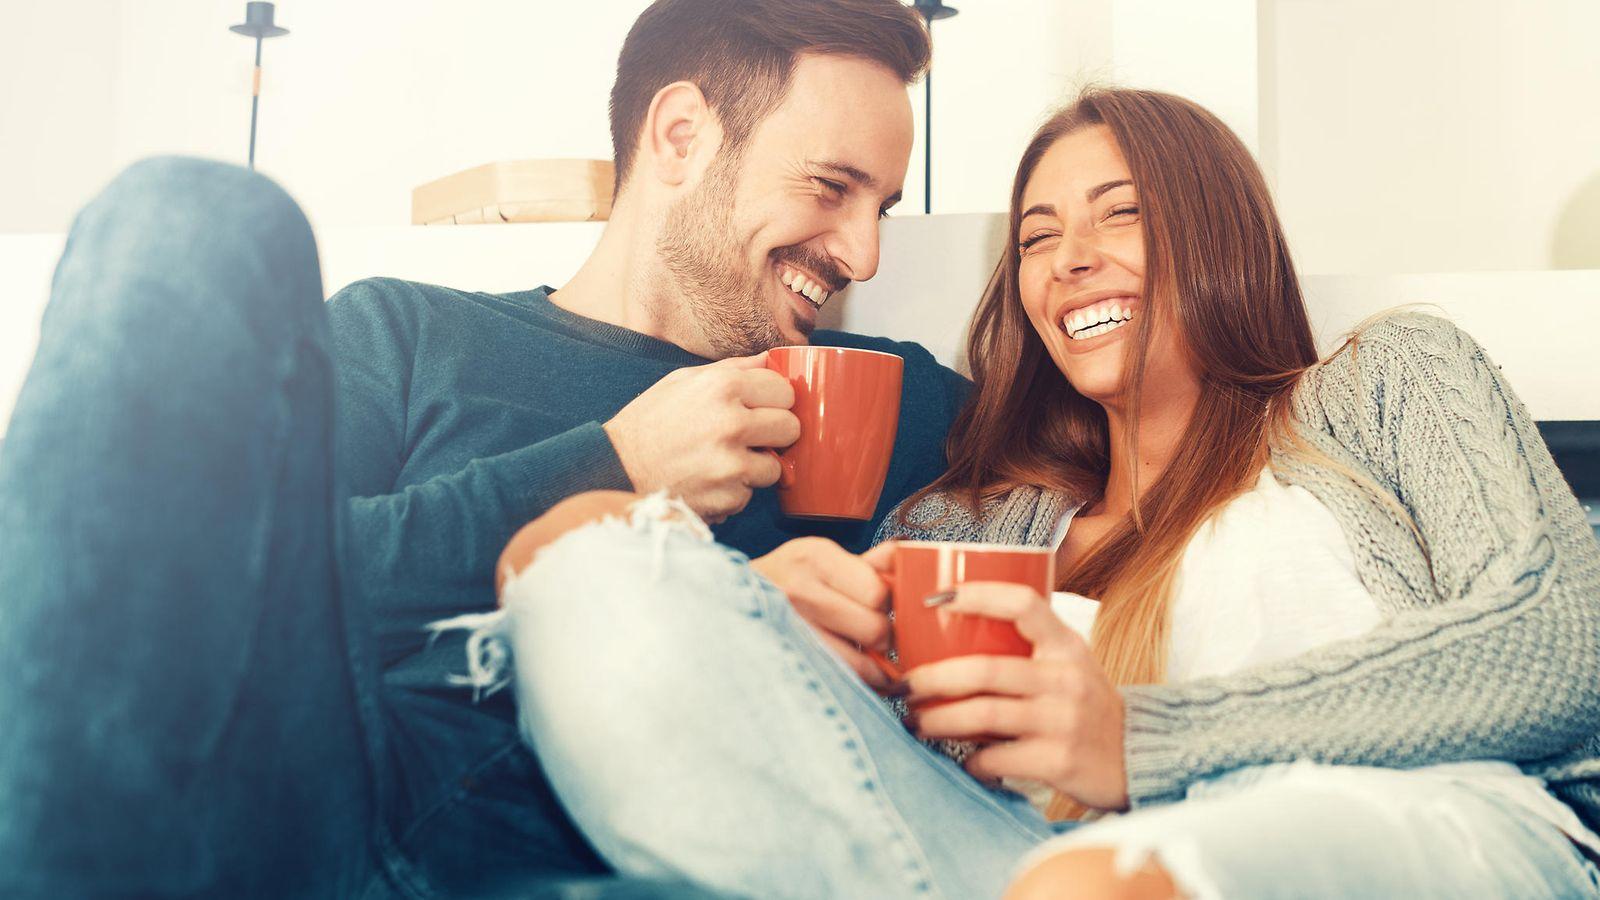 Christian dating okcupid